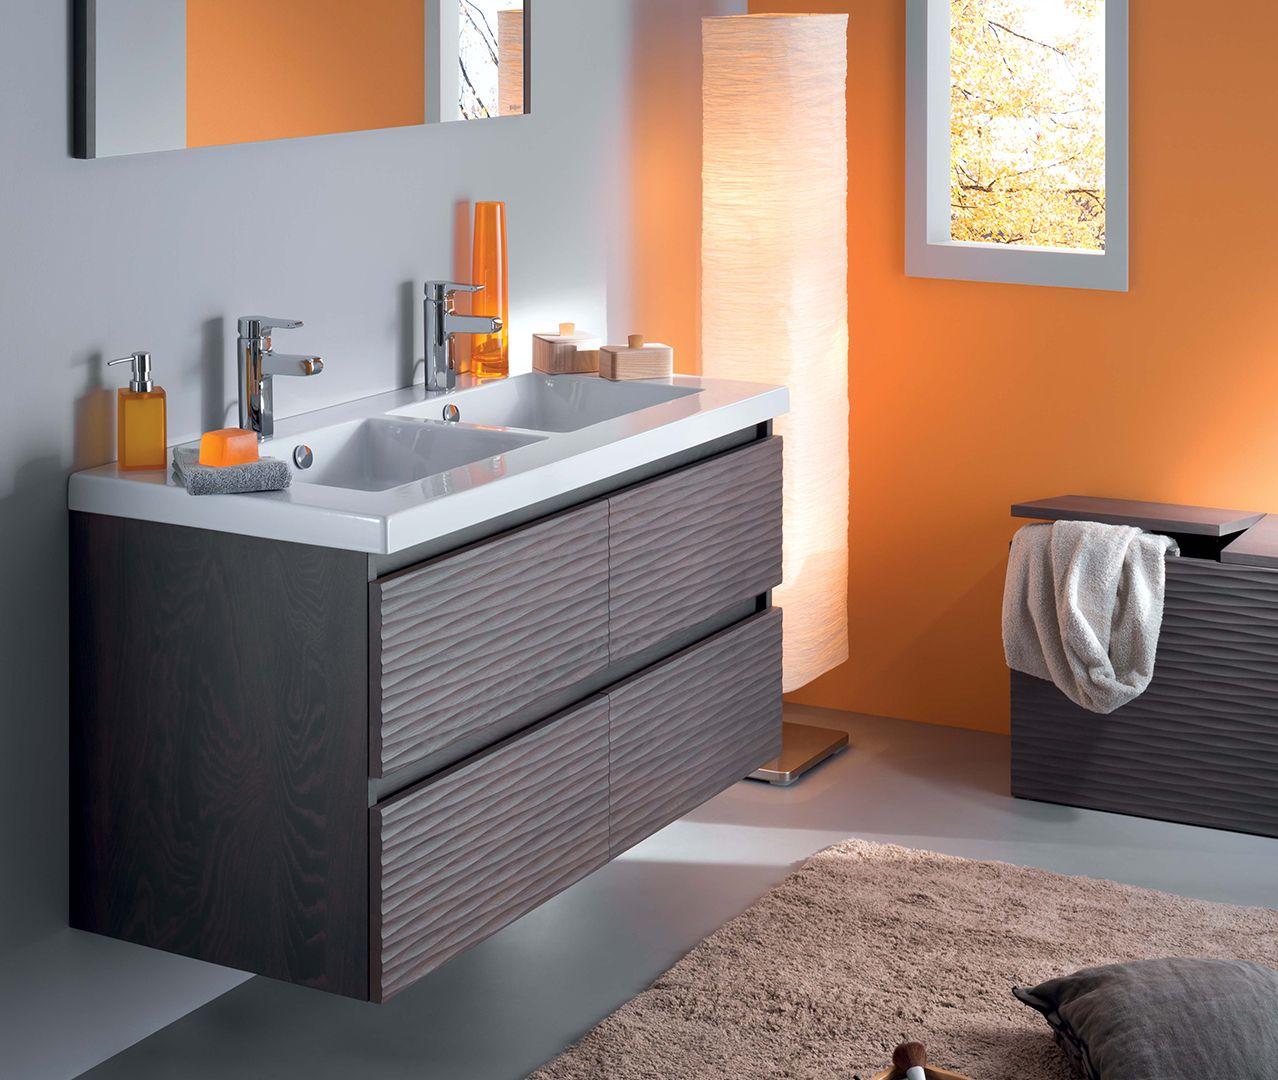 Salle De Bain Atout Kro ~ best salle de bain orange et gris gallery awesome interior home